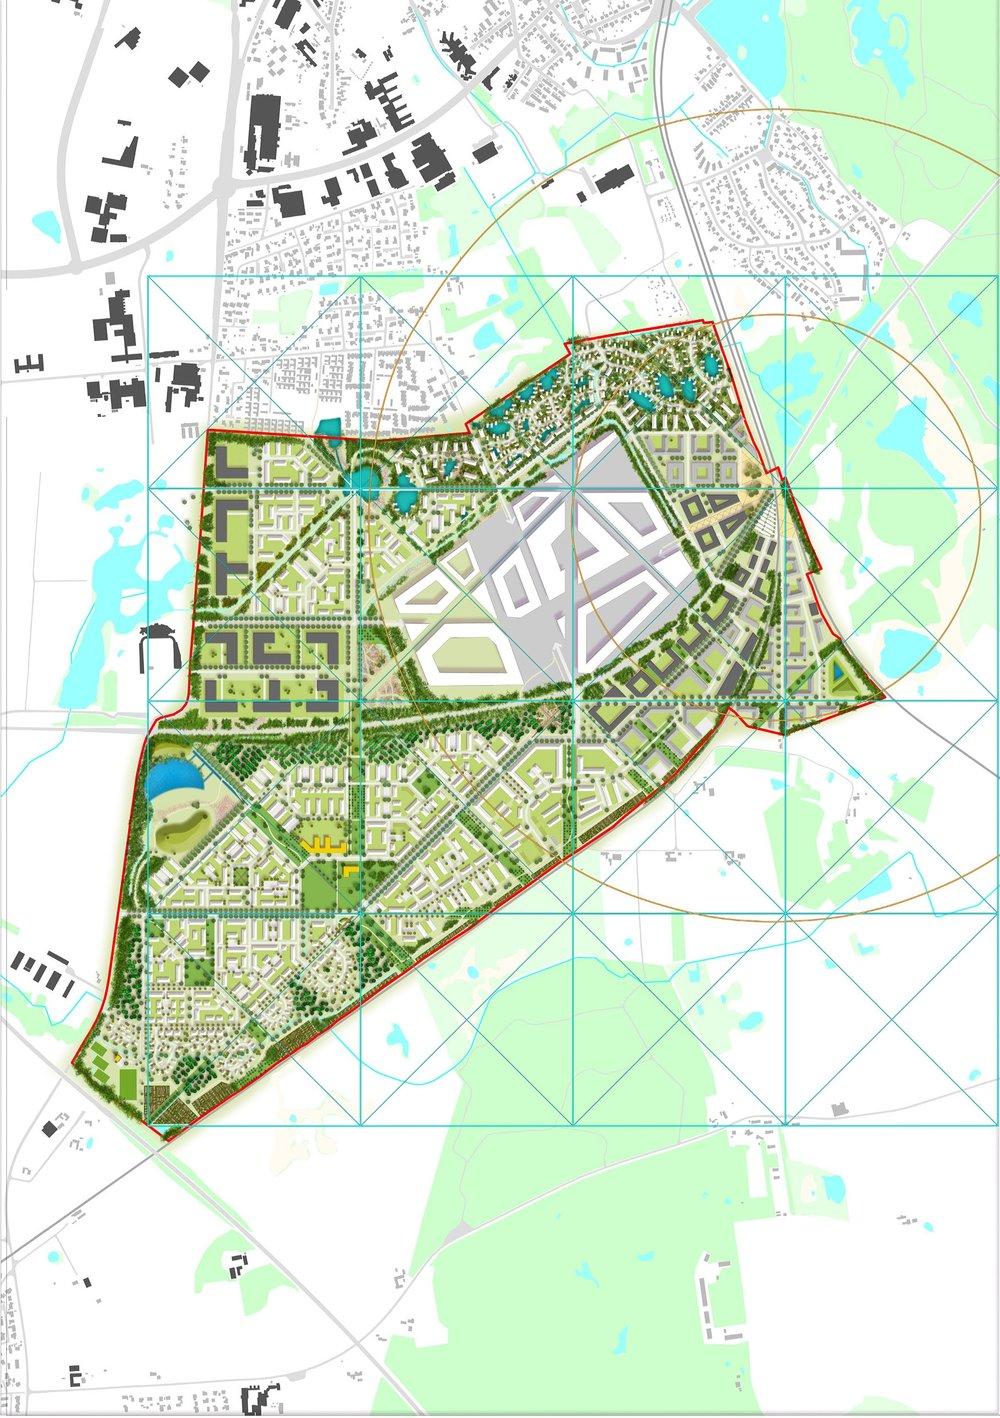 Hillerod Illustrative Plan with grid.jpg